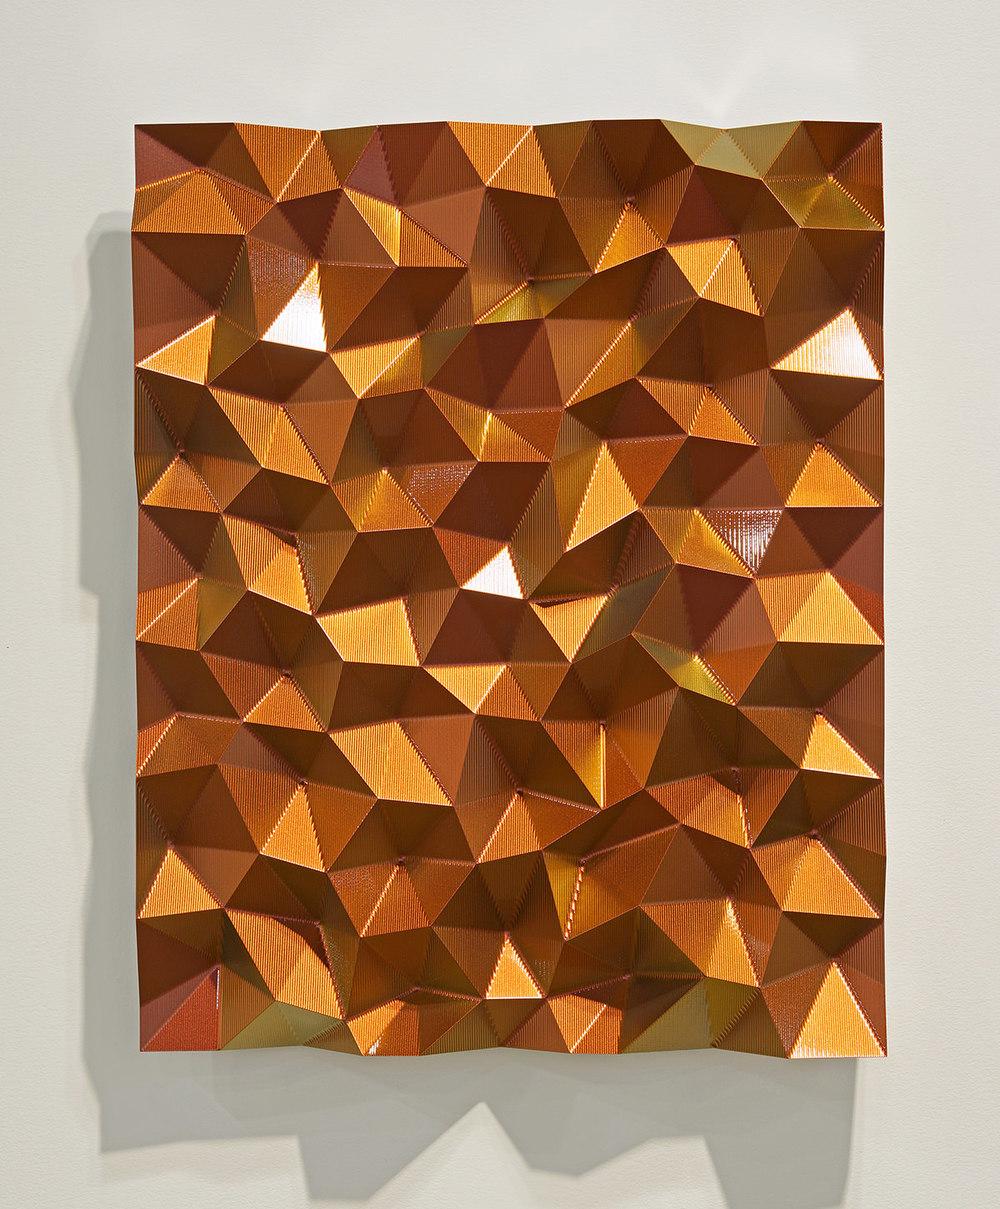 13 Hexagonal Perturbation.jpg